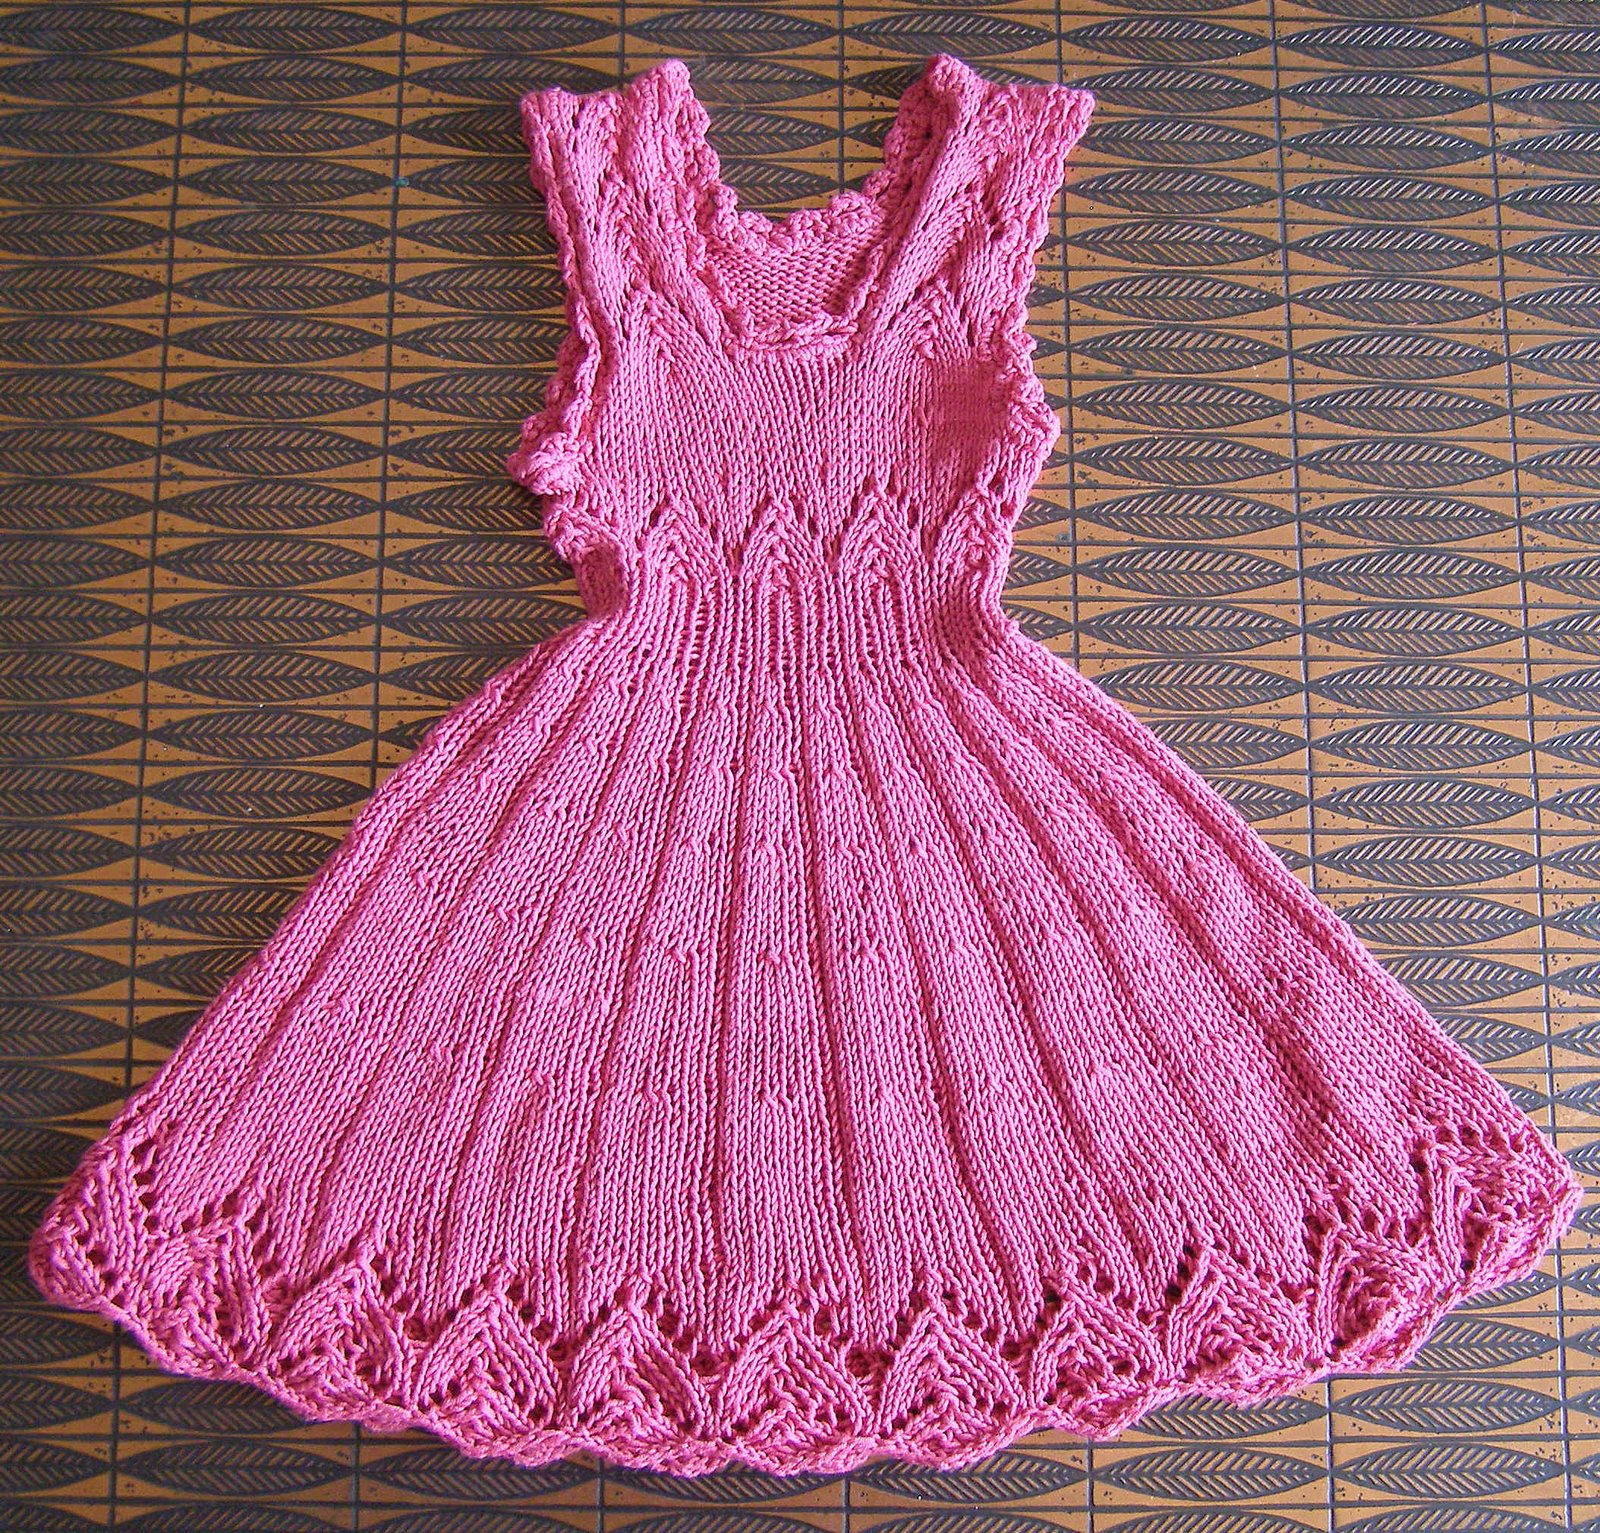 All Free Patterns Knitting : VERA E SUAS MANUALIDADES - Veraxangai: VESTIDO INFANTIL EM TRICO